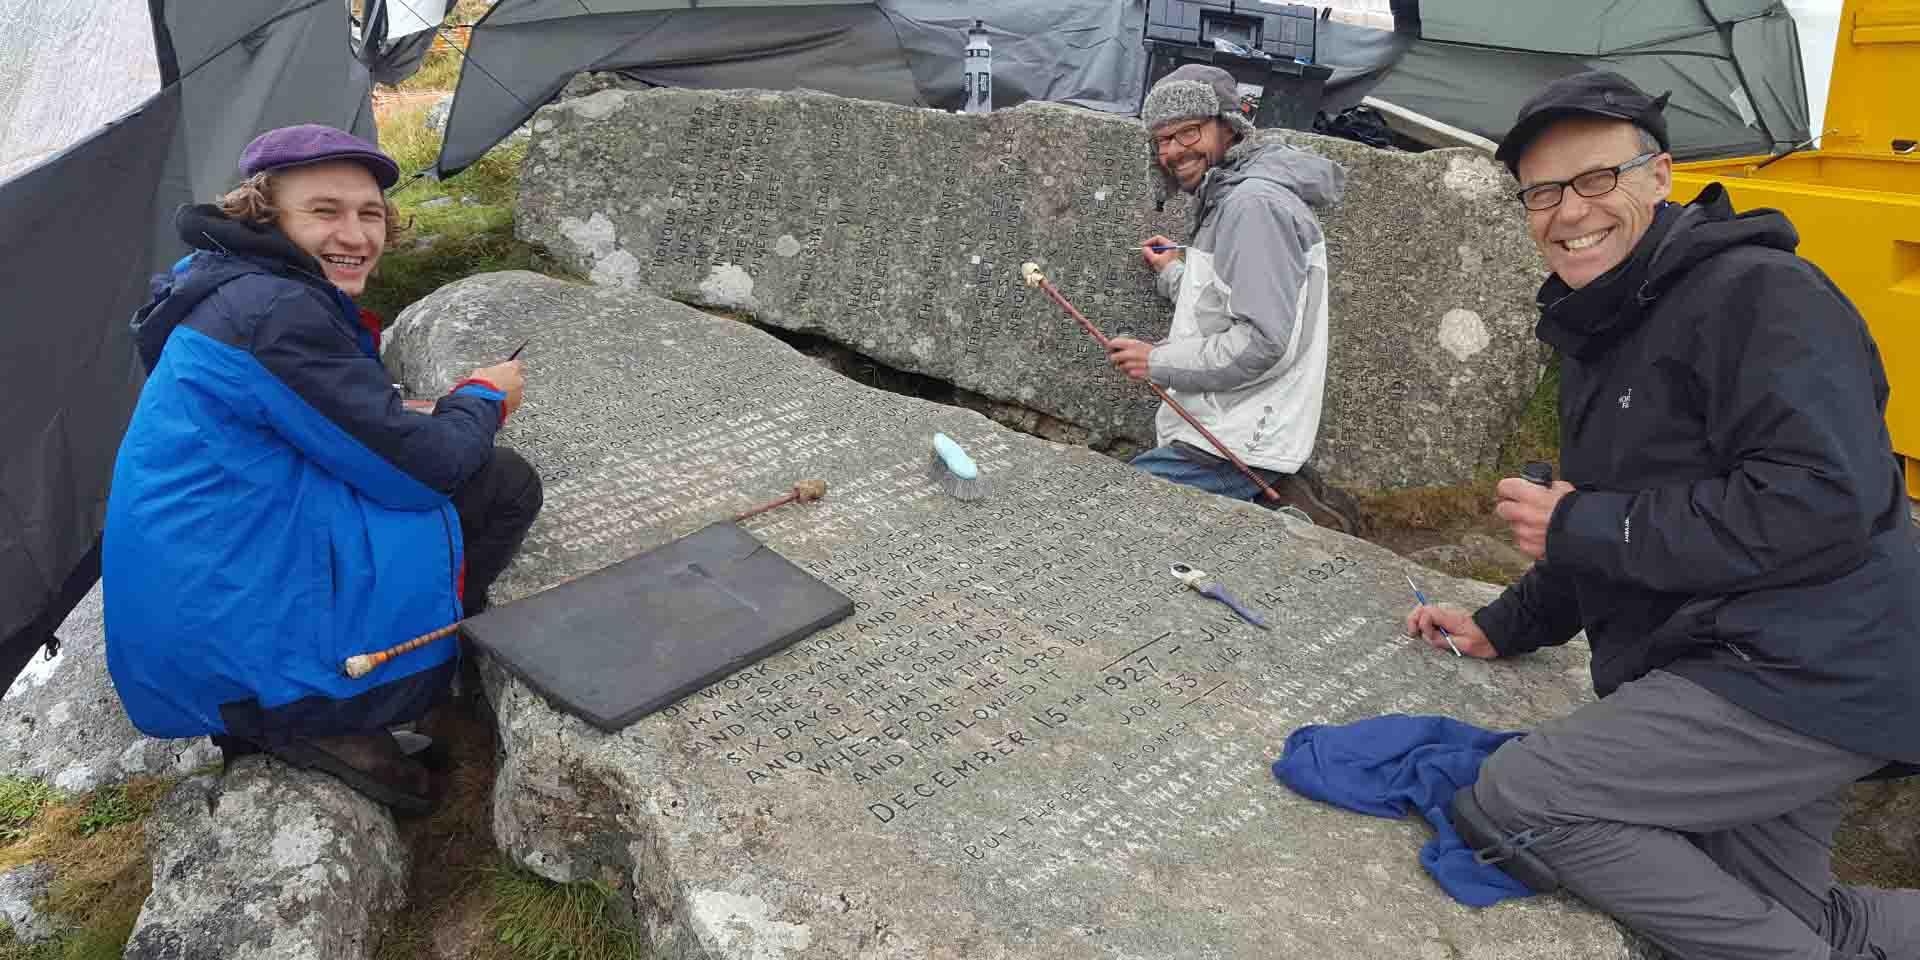 Part of the team that restored the Ten Commandment stones